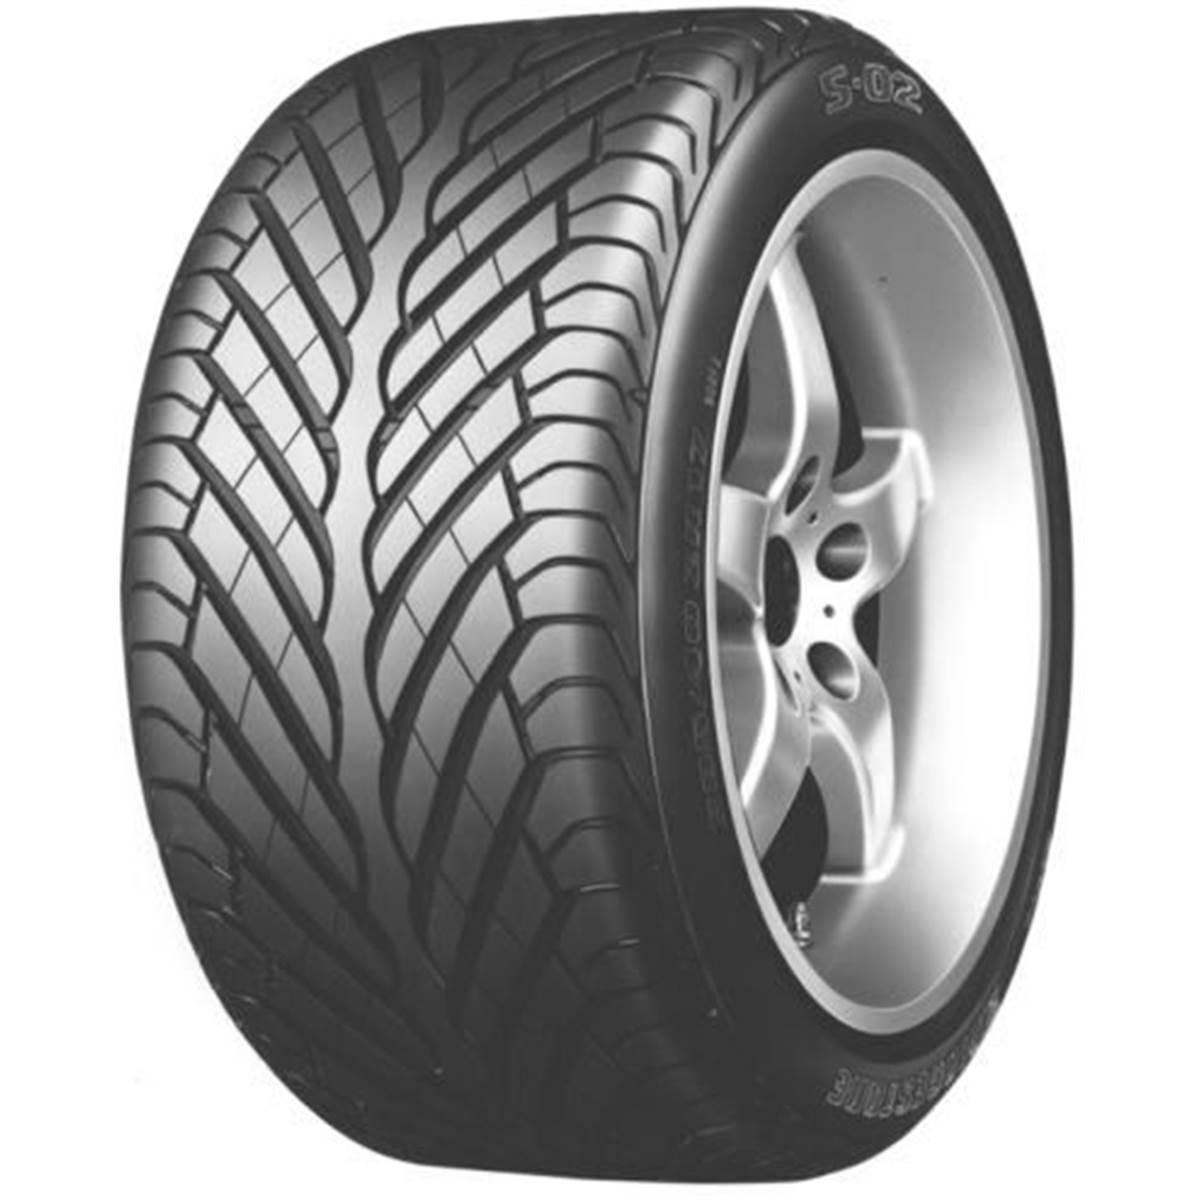 Pneu Bridgestone 225/50R16 Z Potenza S02